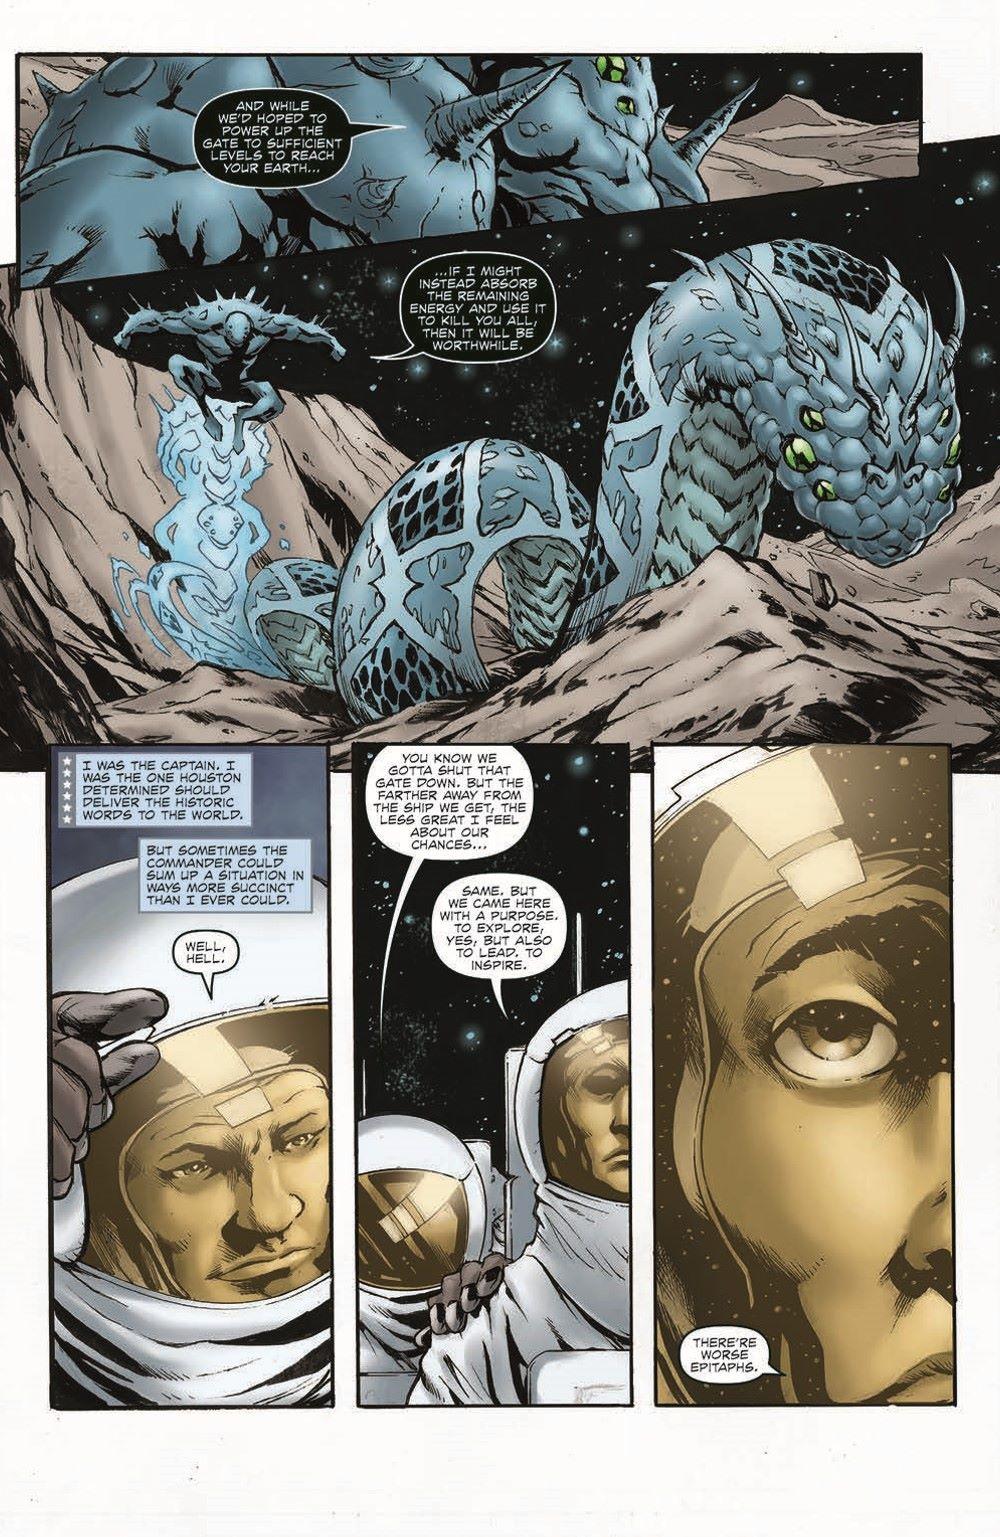 DireWraiths03_pr-6 ComicList Previews: ROM DIRE WRAITHS #3 (OF 3)